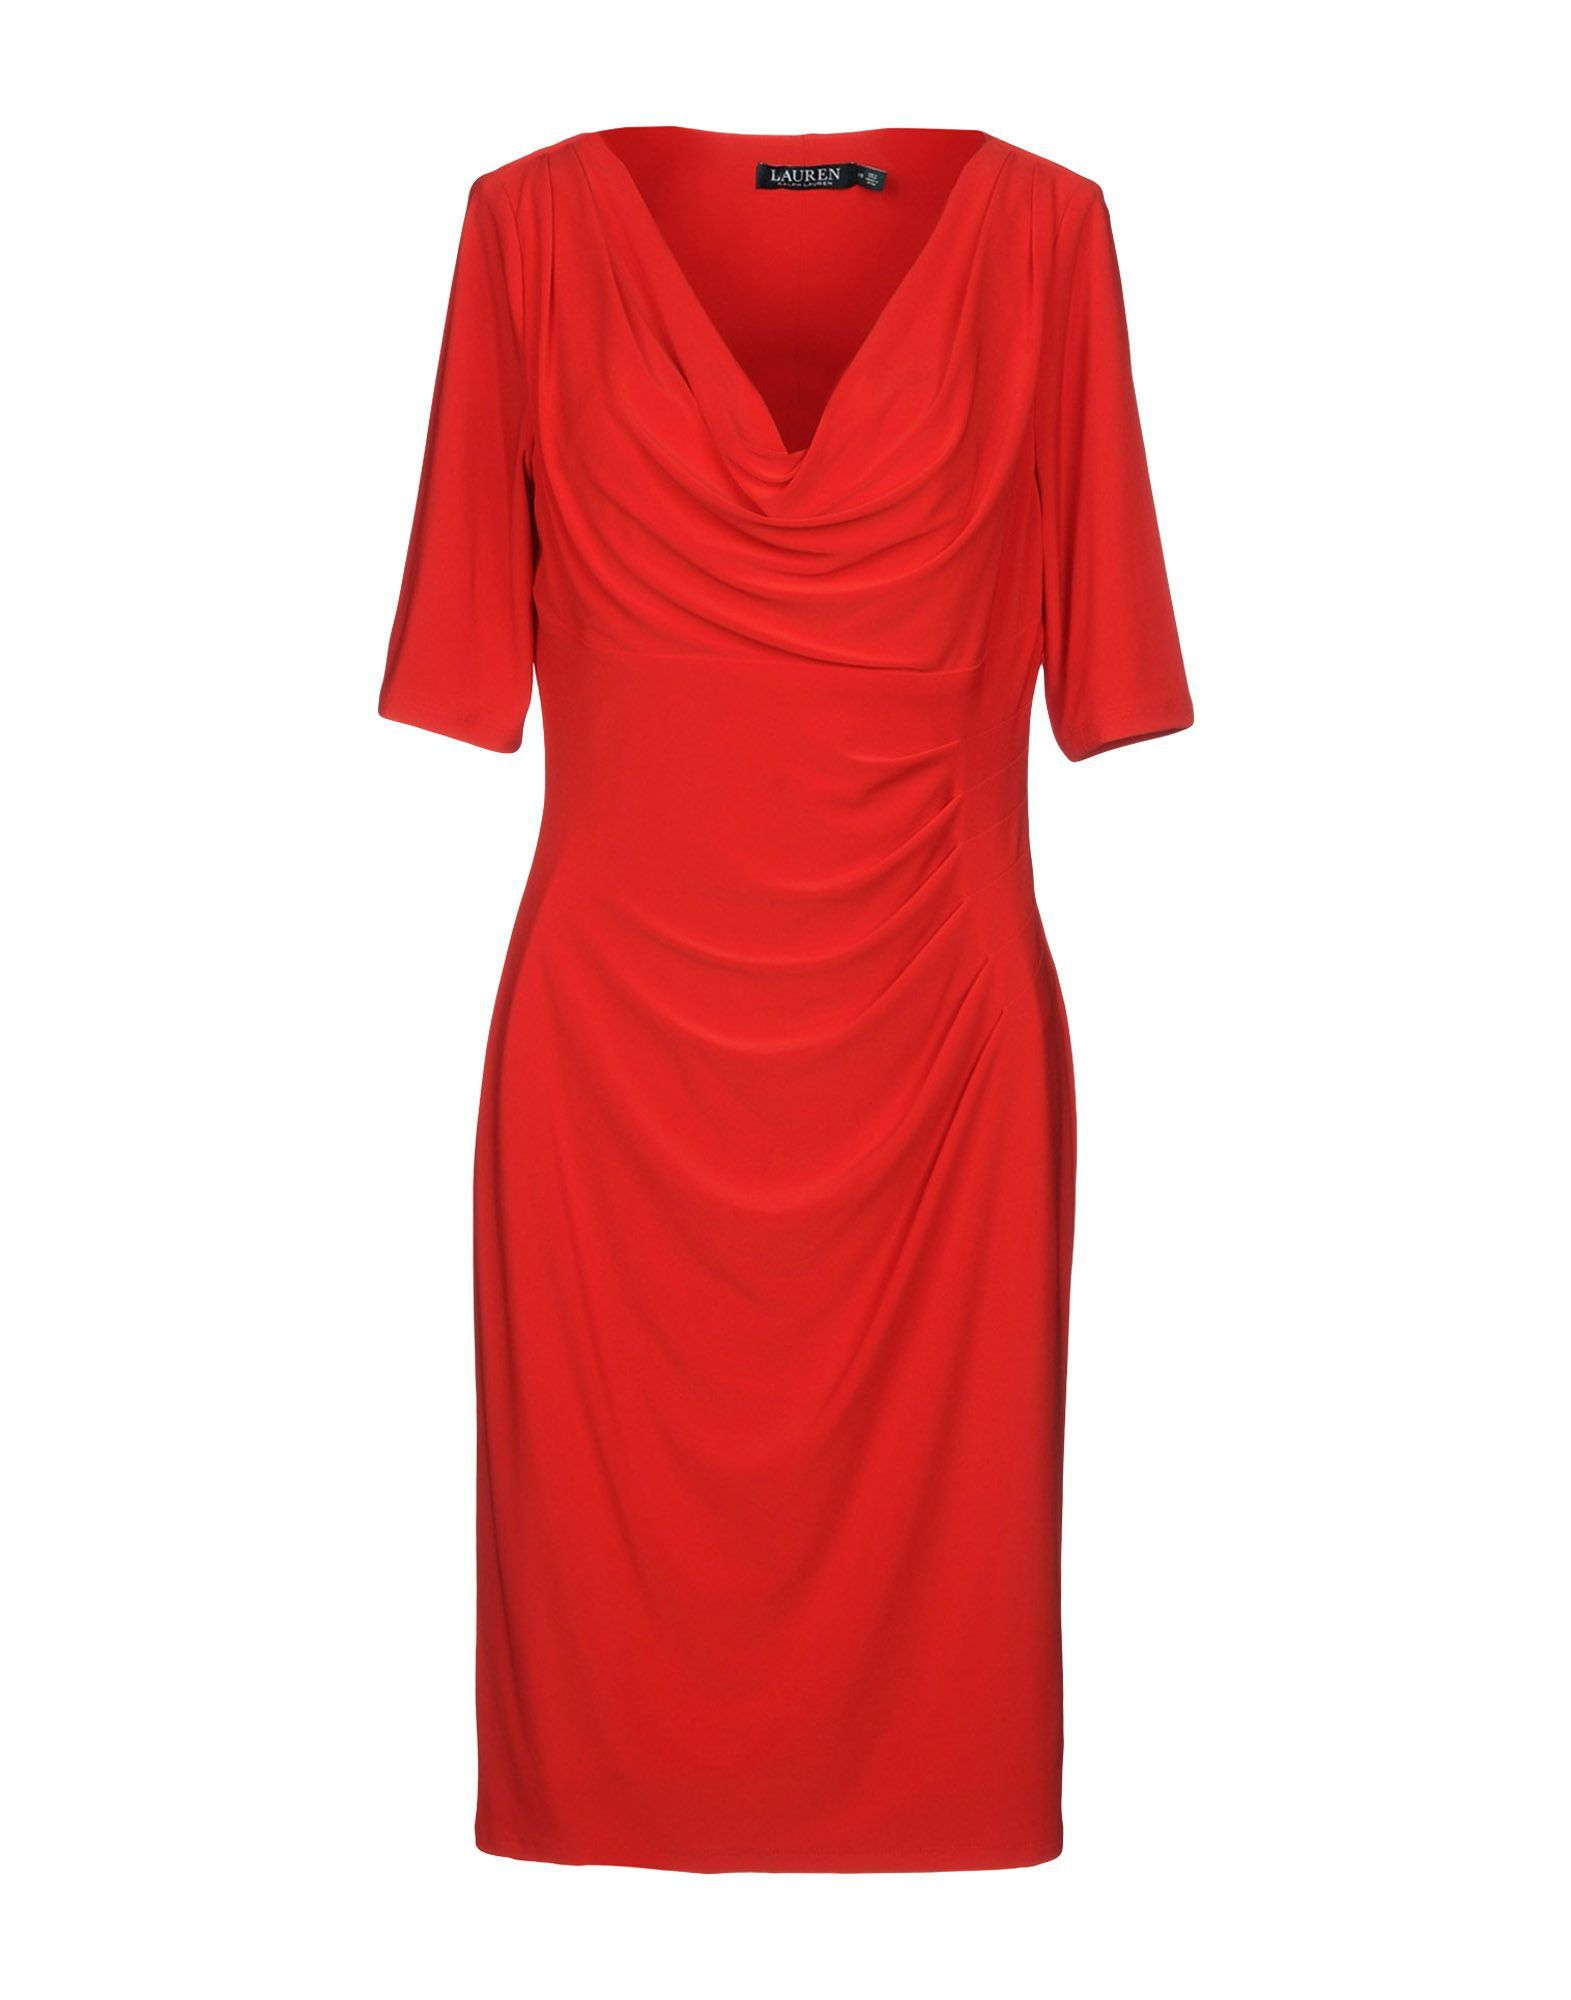 Lauren Ralph Lauren Red Jersey Draped Dress